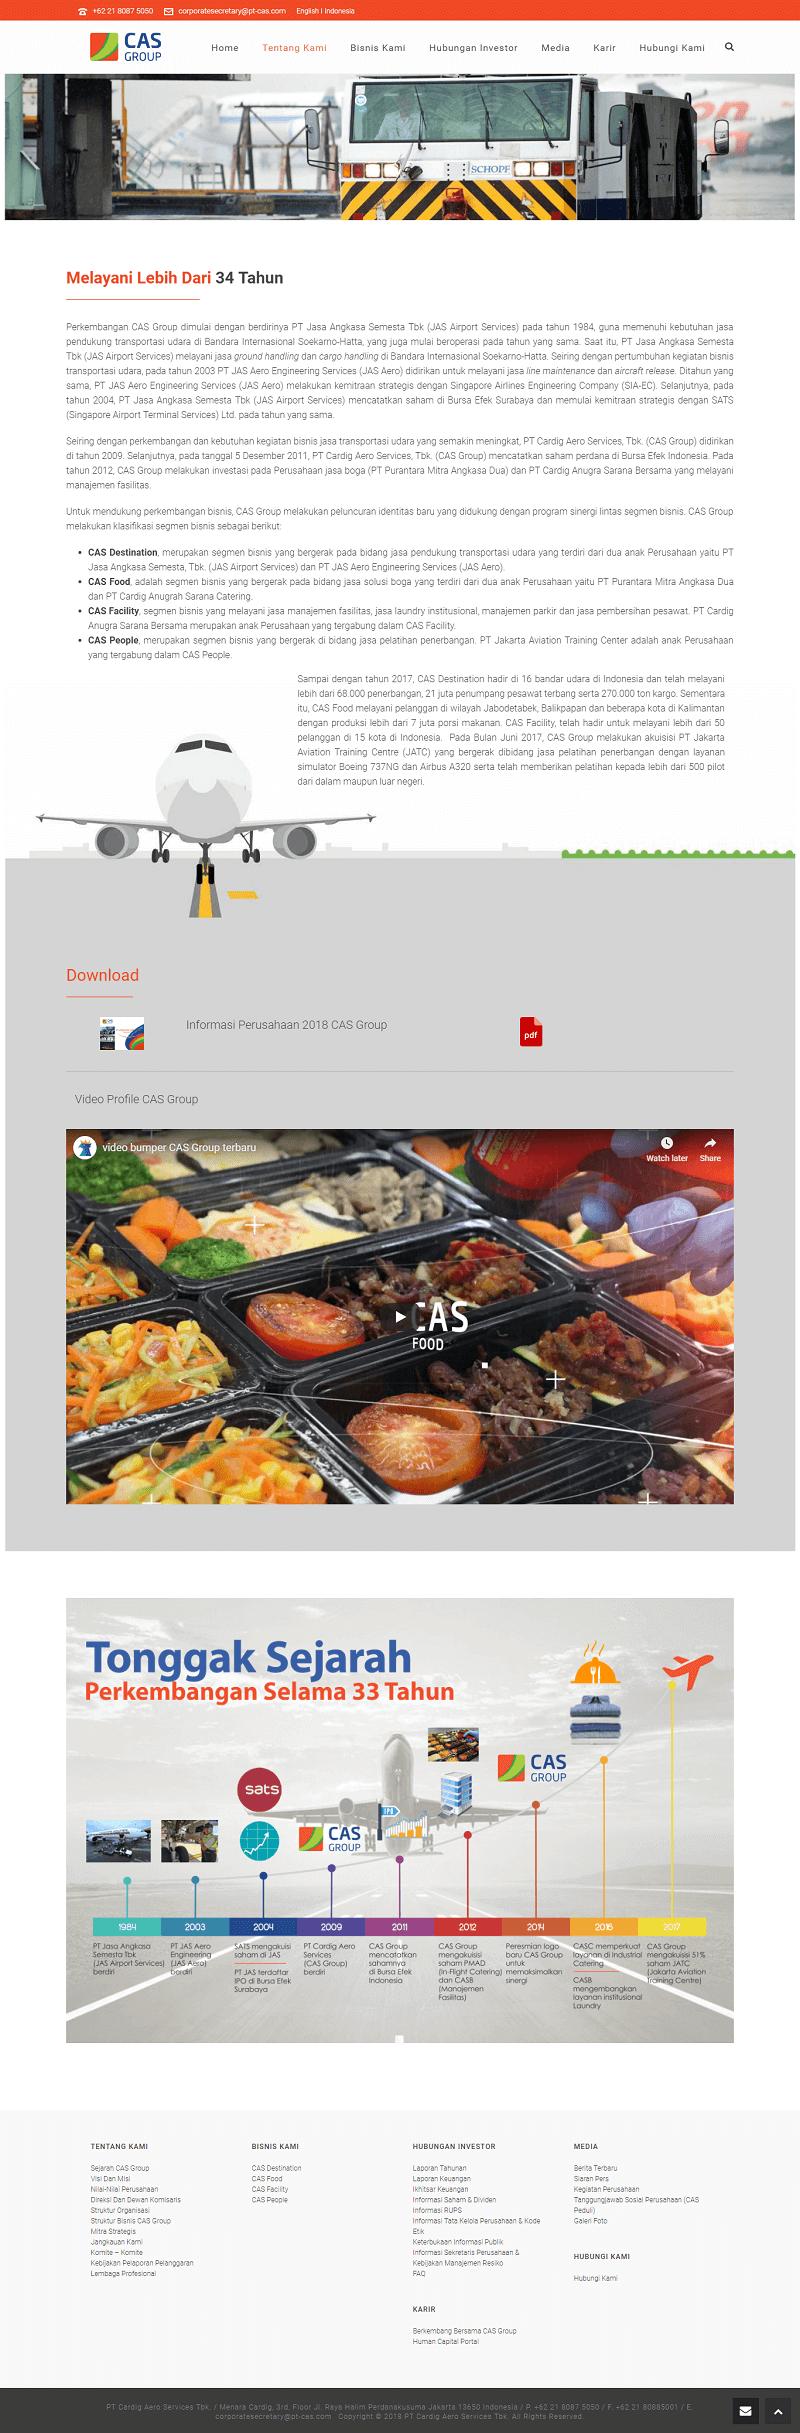 portofolio-jasa-pembuatan-website-website-company-profile-capture-cas-group-2